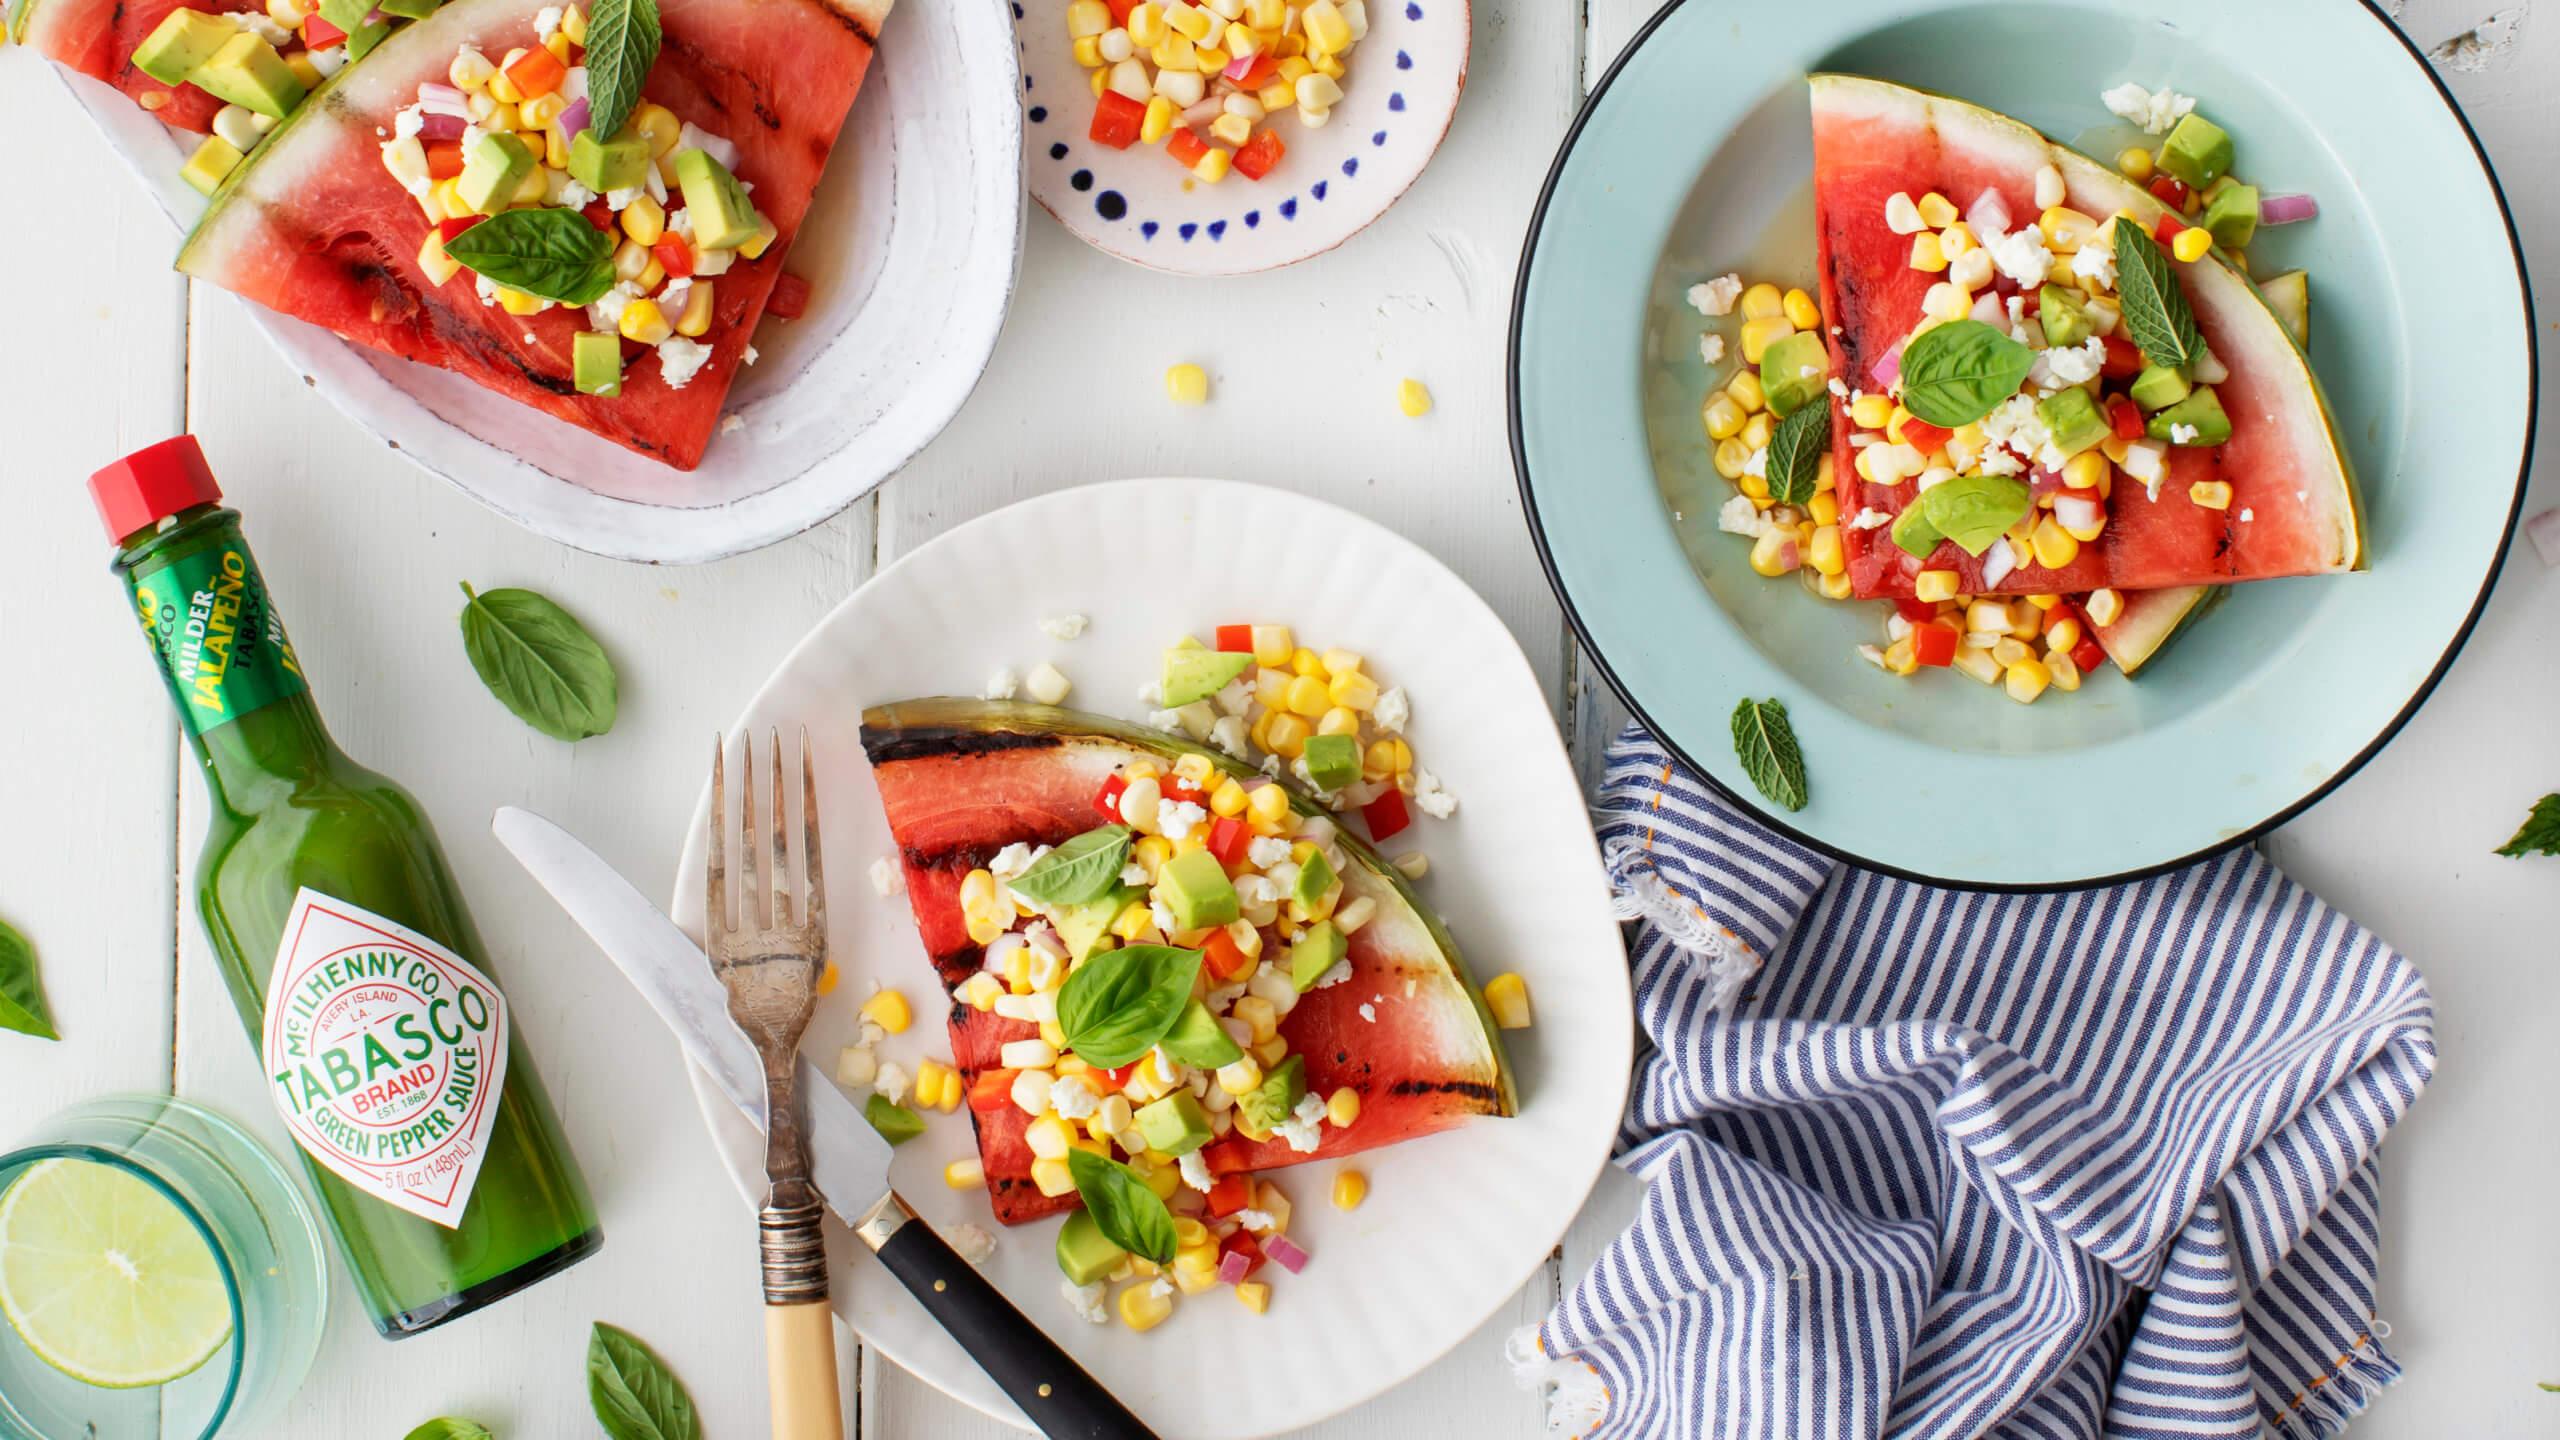 Grilled Watermelon Steaks with Avocado, Corn & Feta